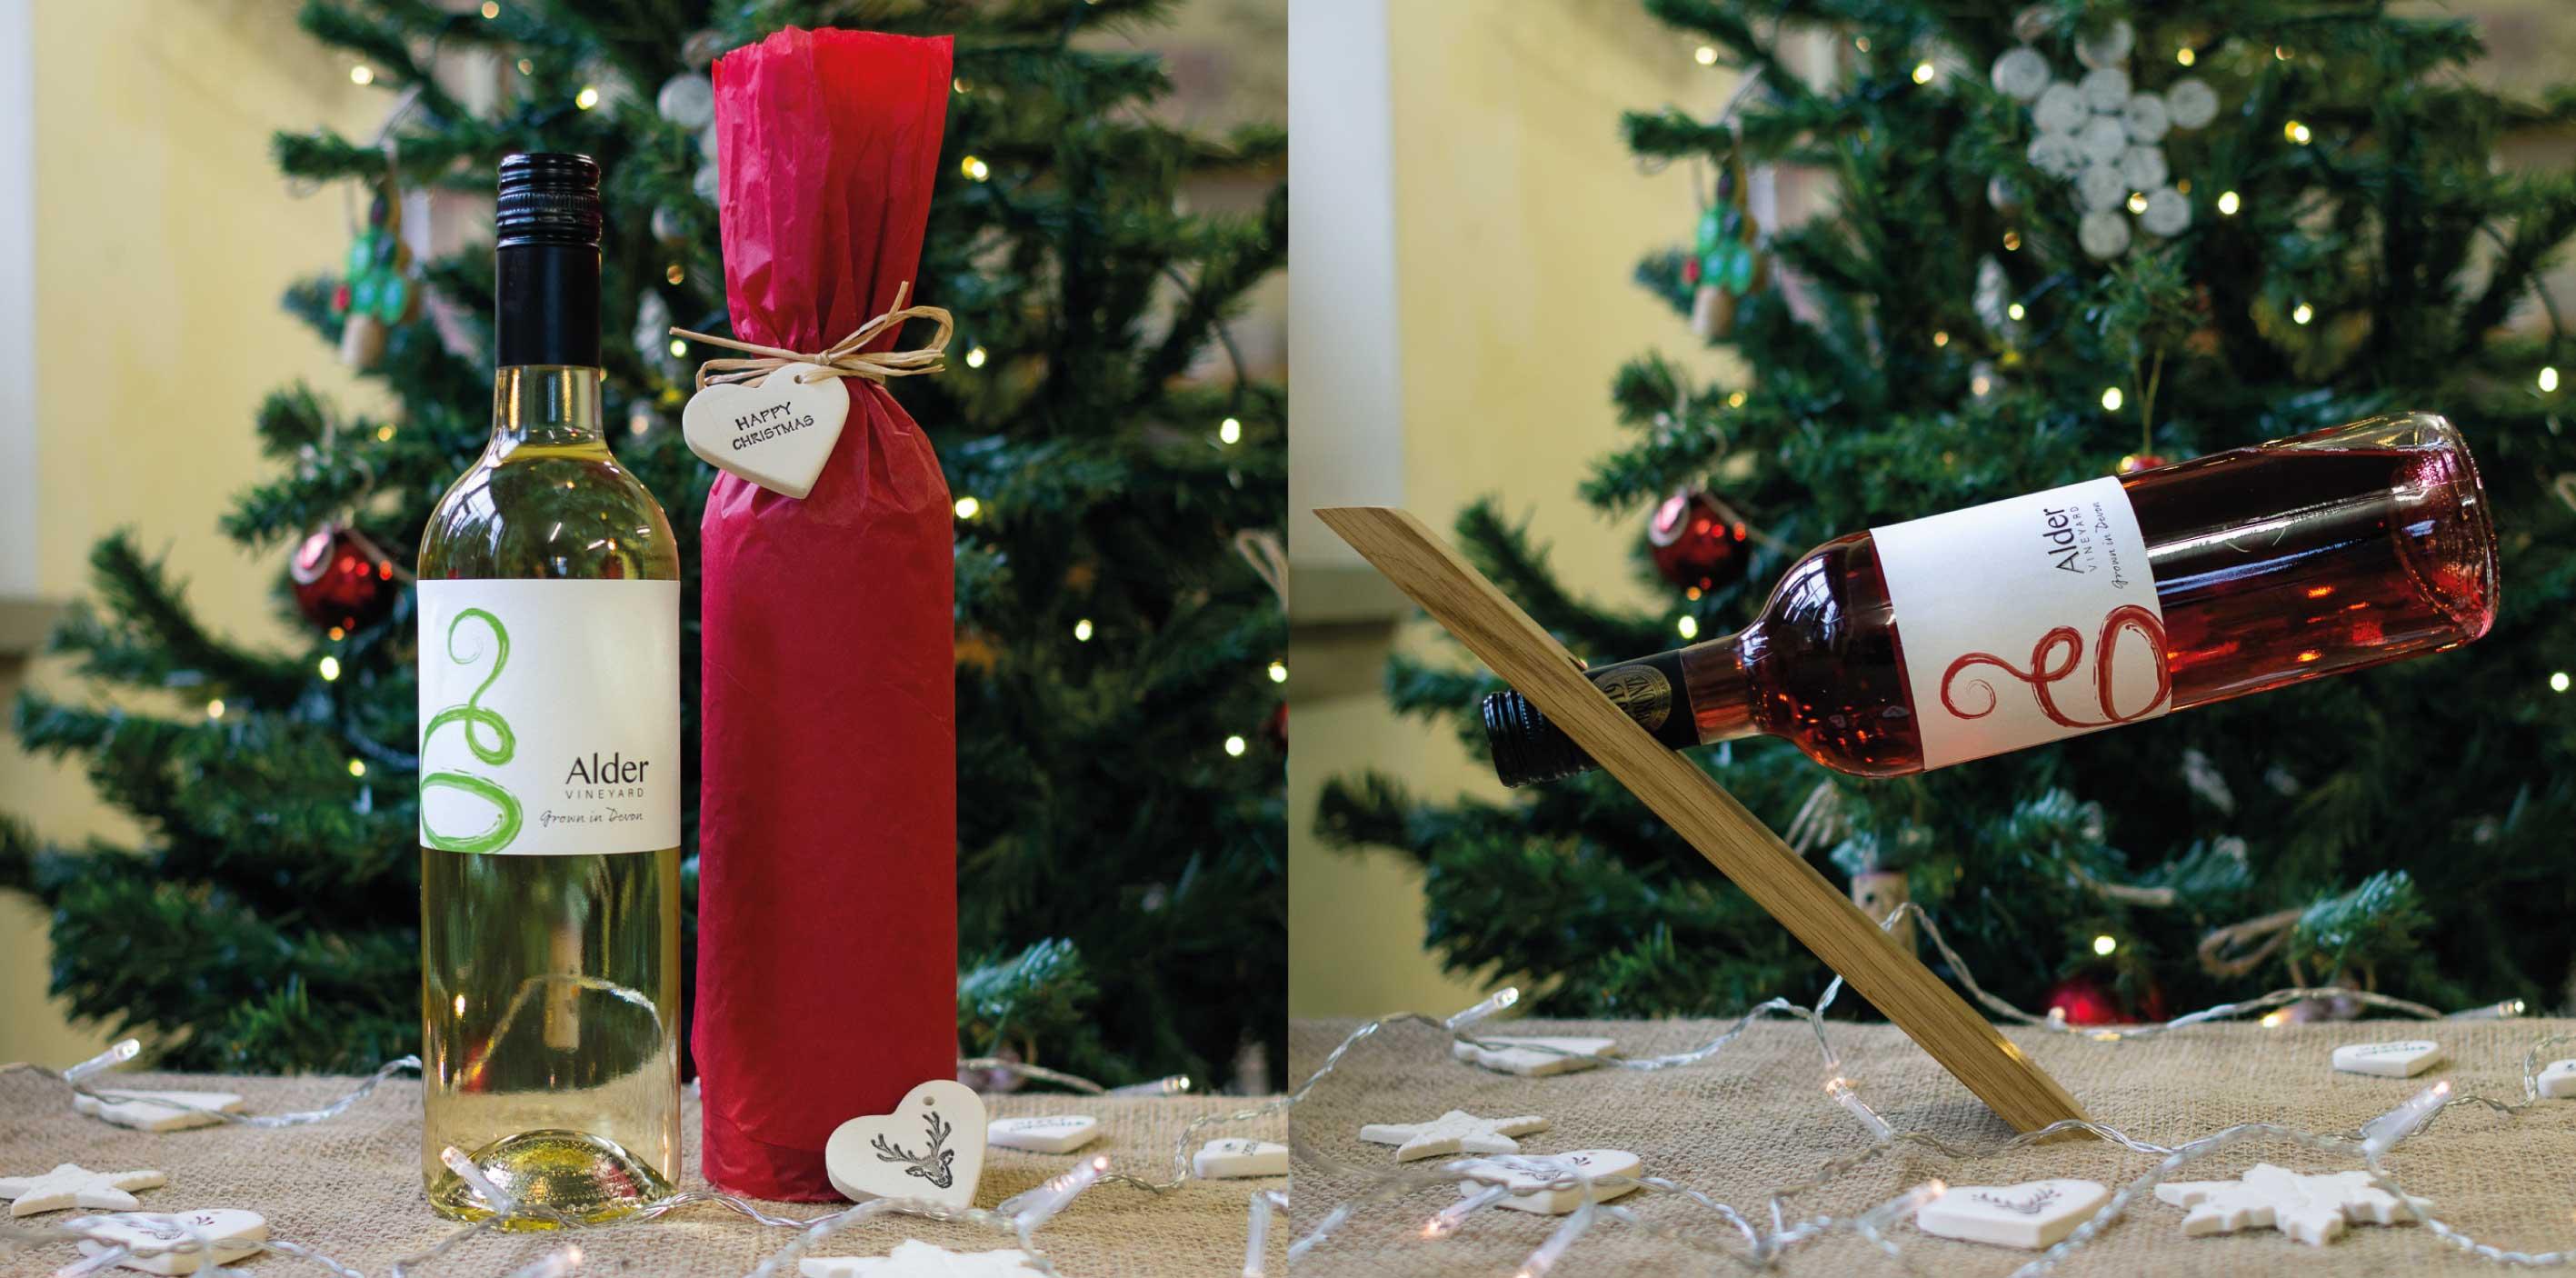 Buy local wine this Christmas at Alder Vineyard